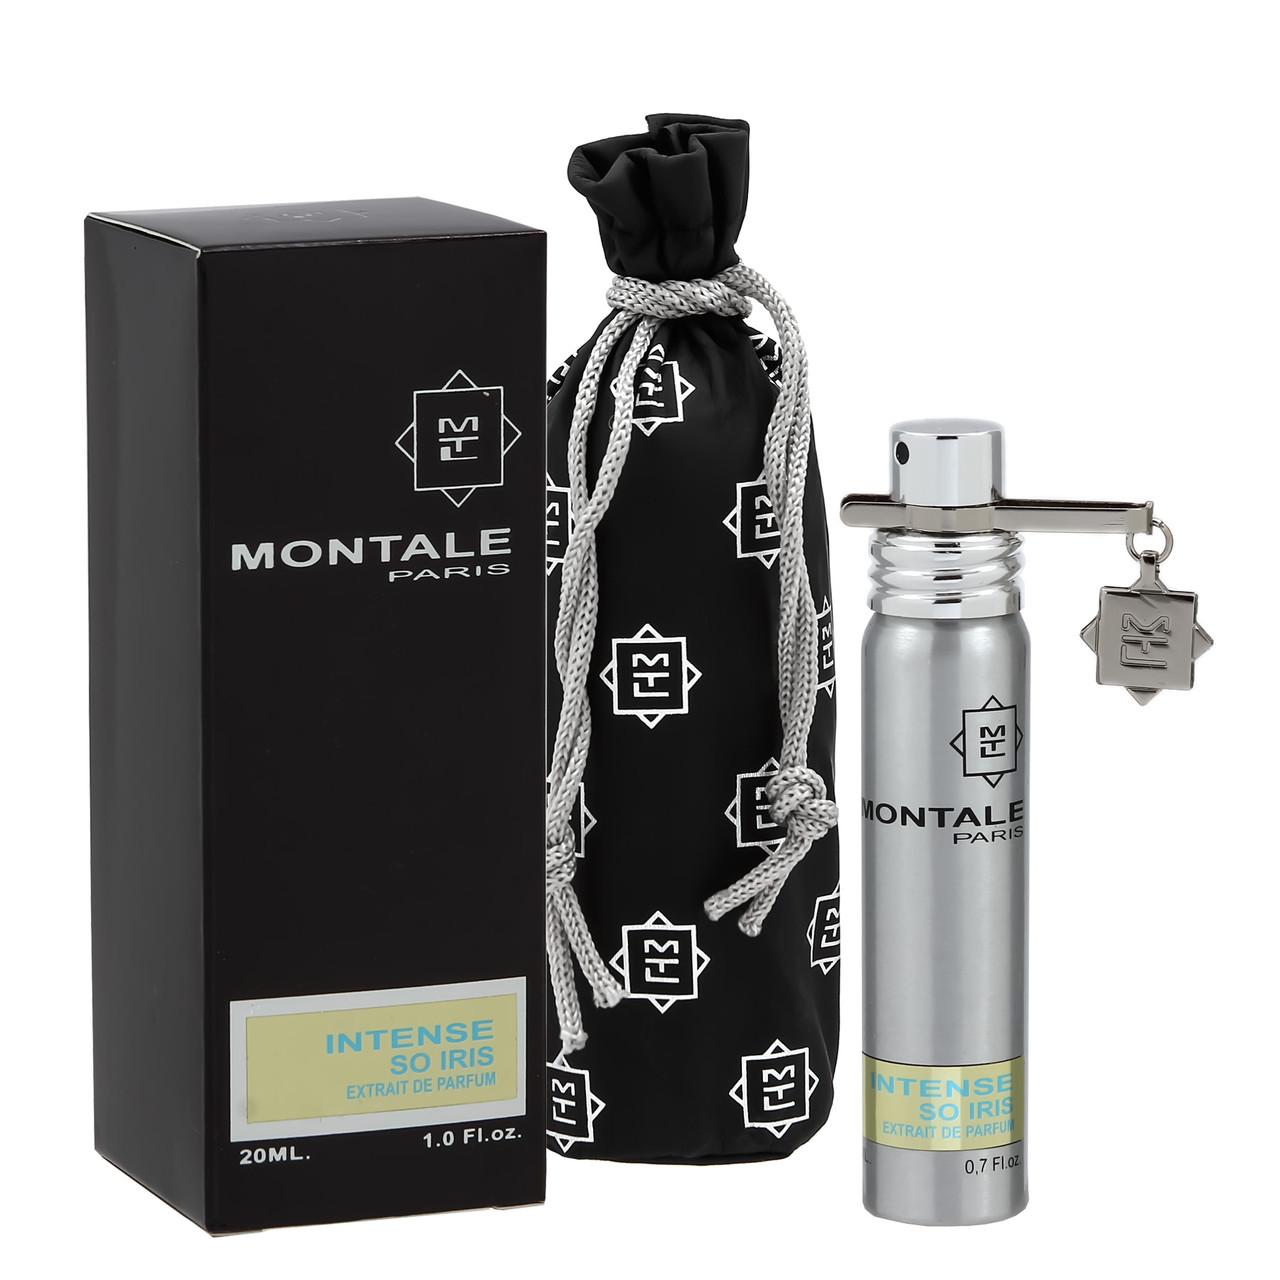 Унисекс мини-парфюм с феромонами Montale Intense So Iris (Интенсивный ирис), 20 мл